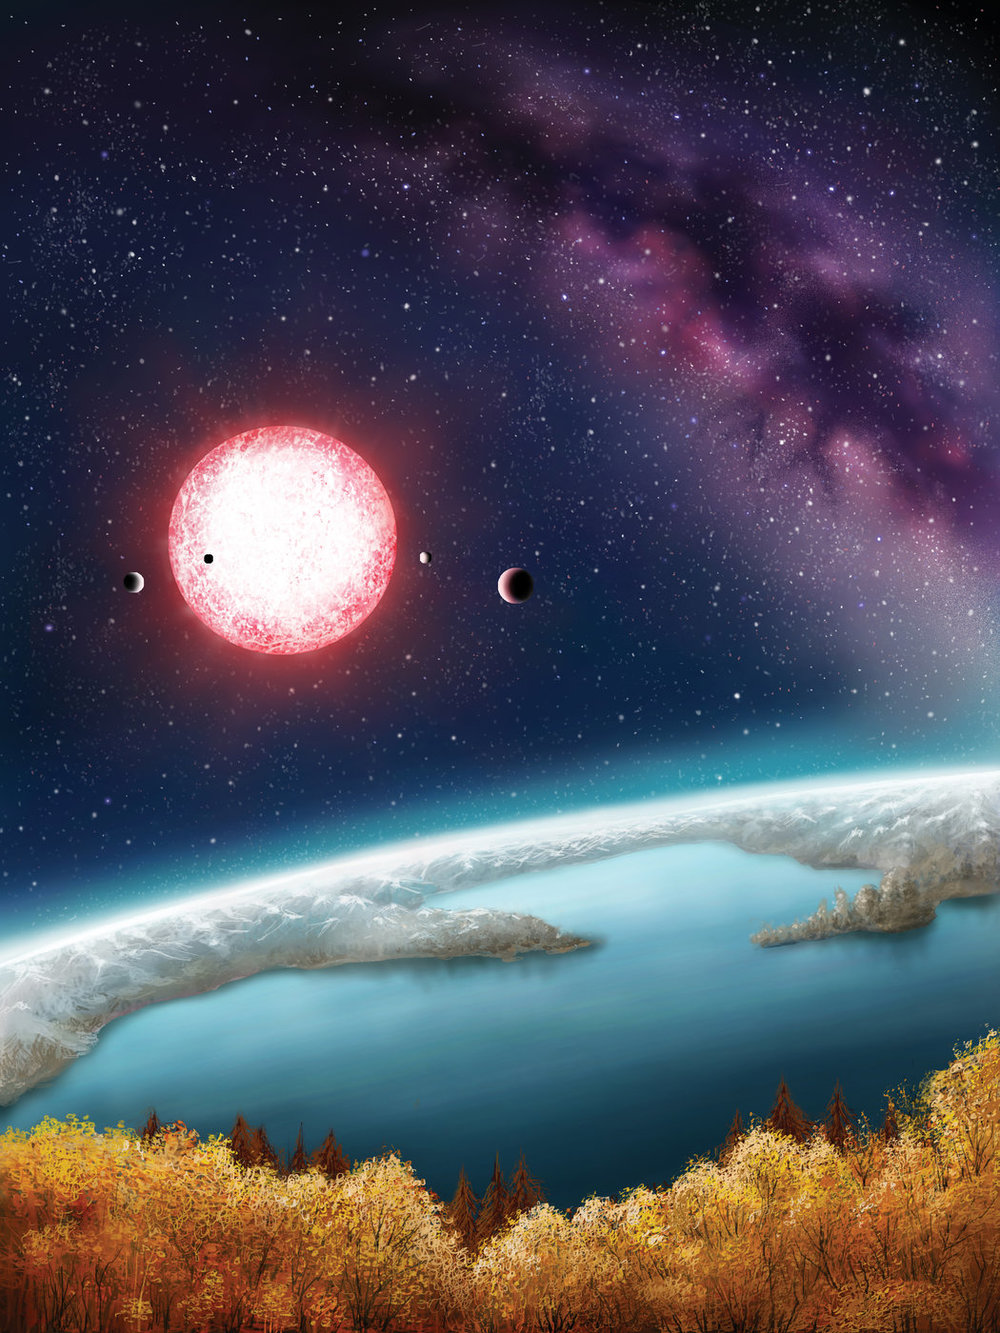 Artist's impression of the Archipelago world, Kepler 186f. Credit: Danielle Futselaar